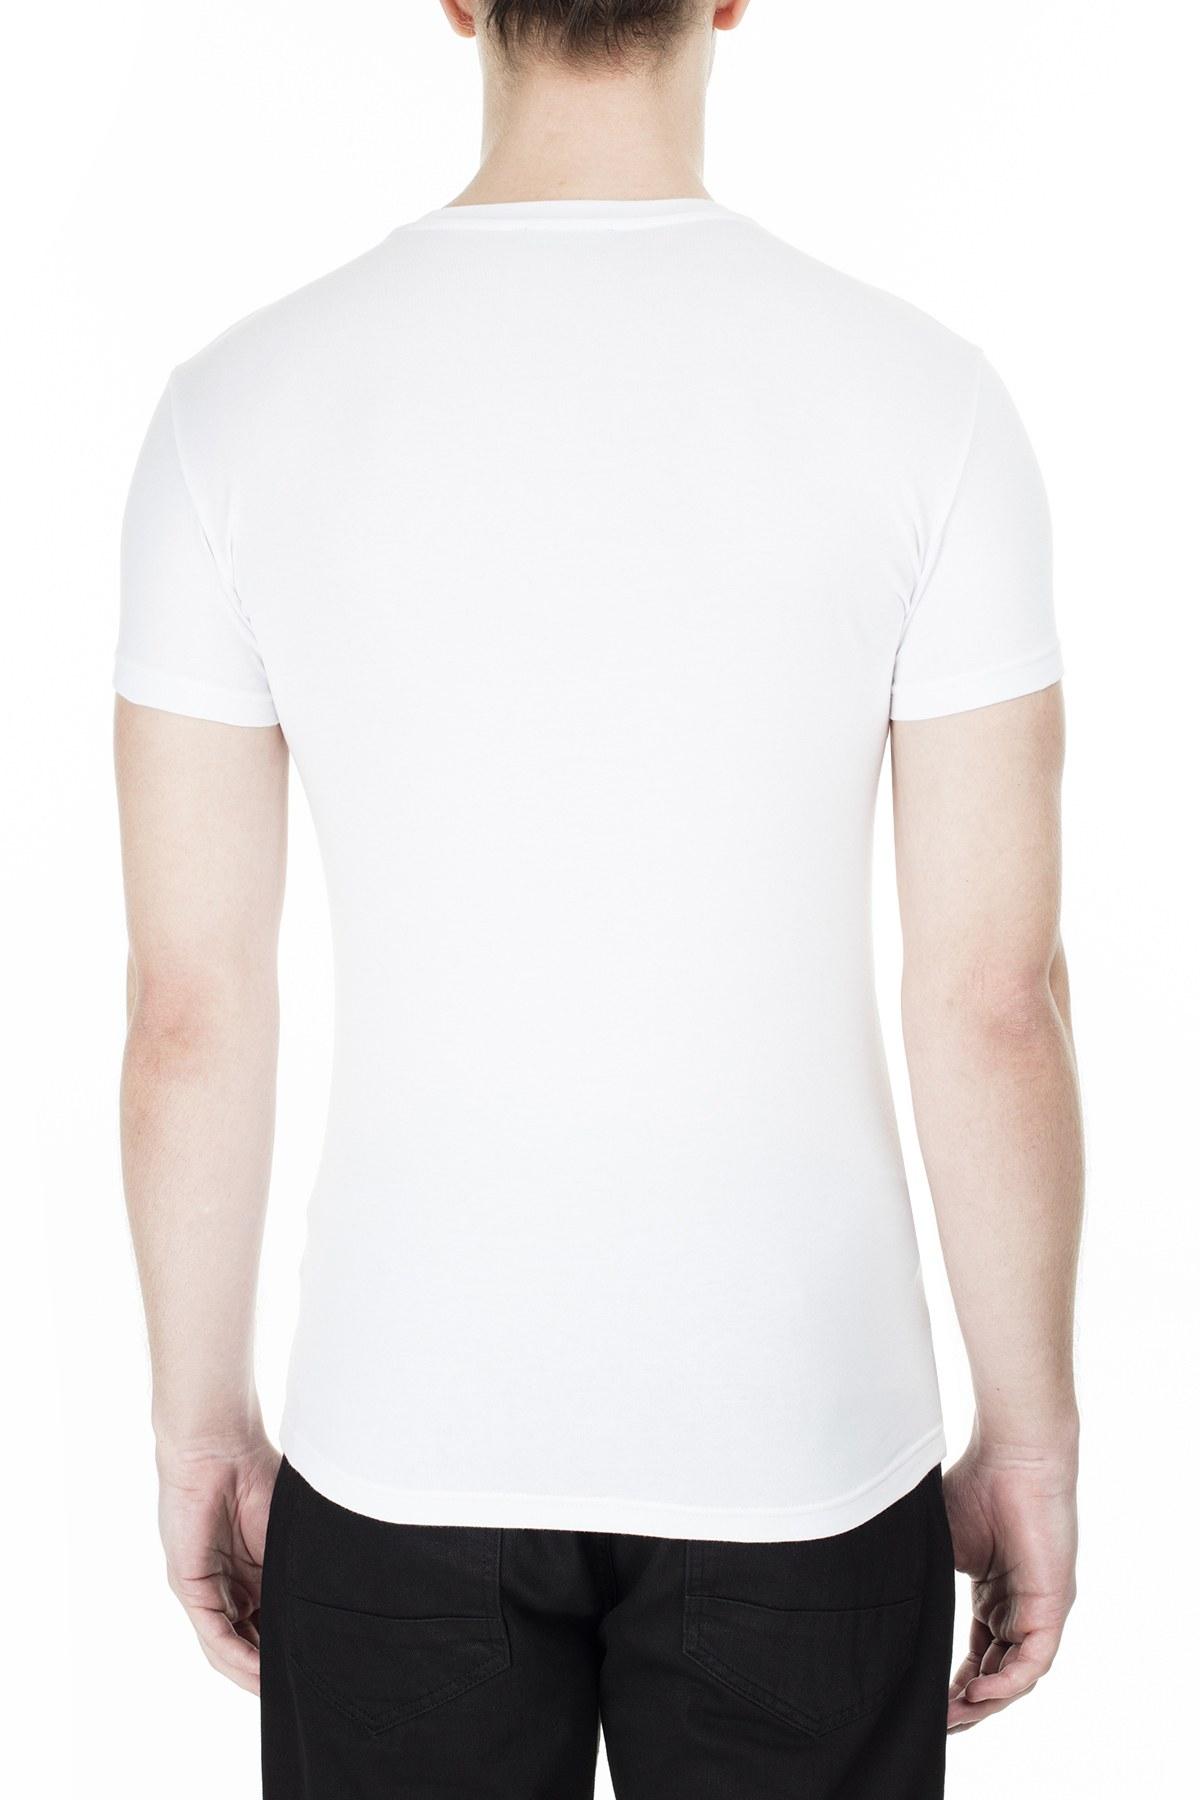 Emporio Armani Erkek T Shirt 111035 0P516 00010 BEYAZ